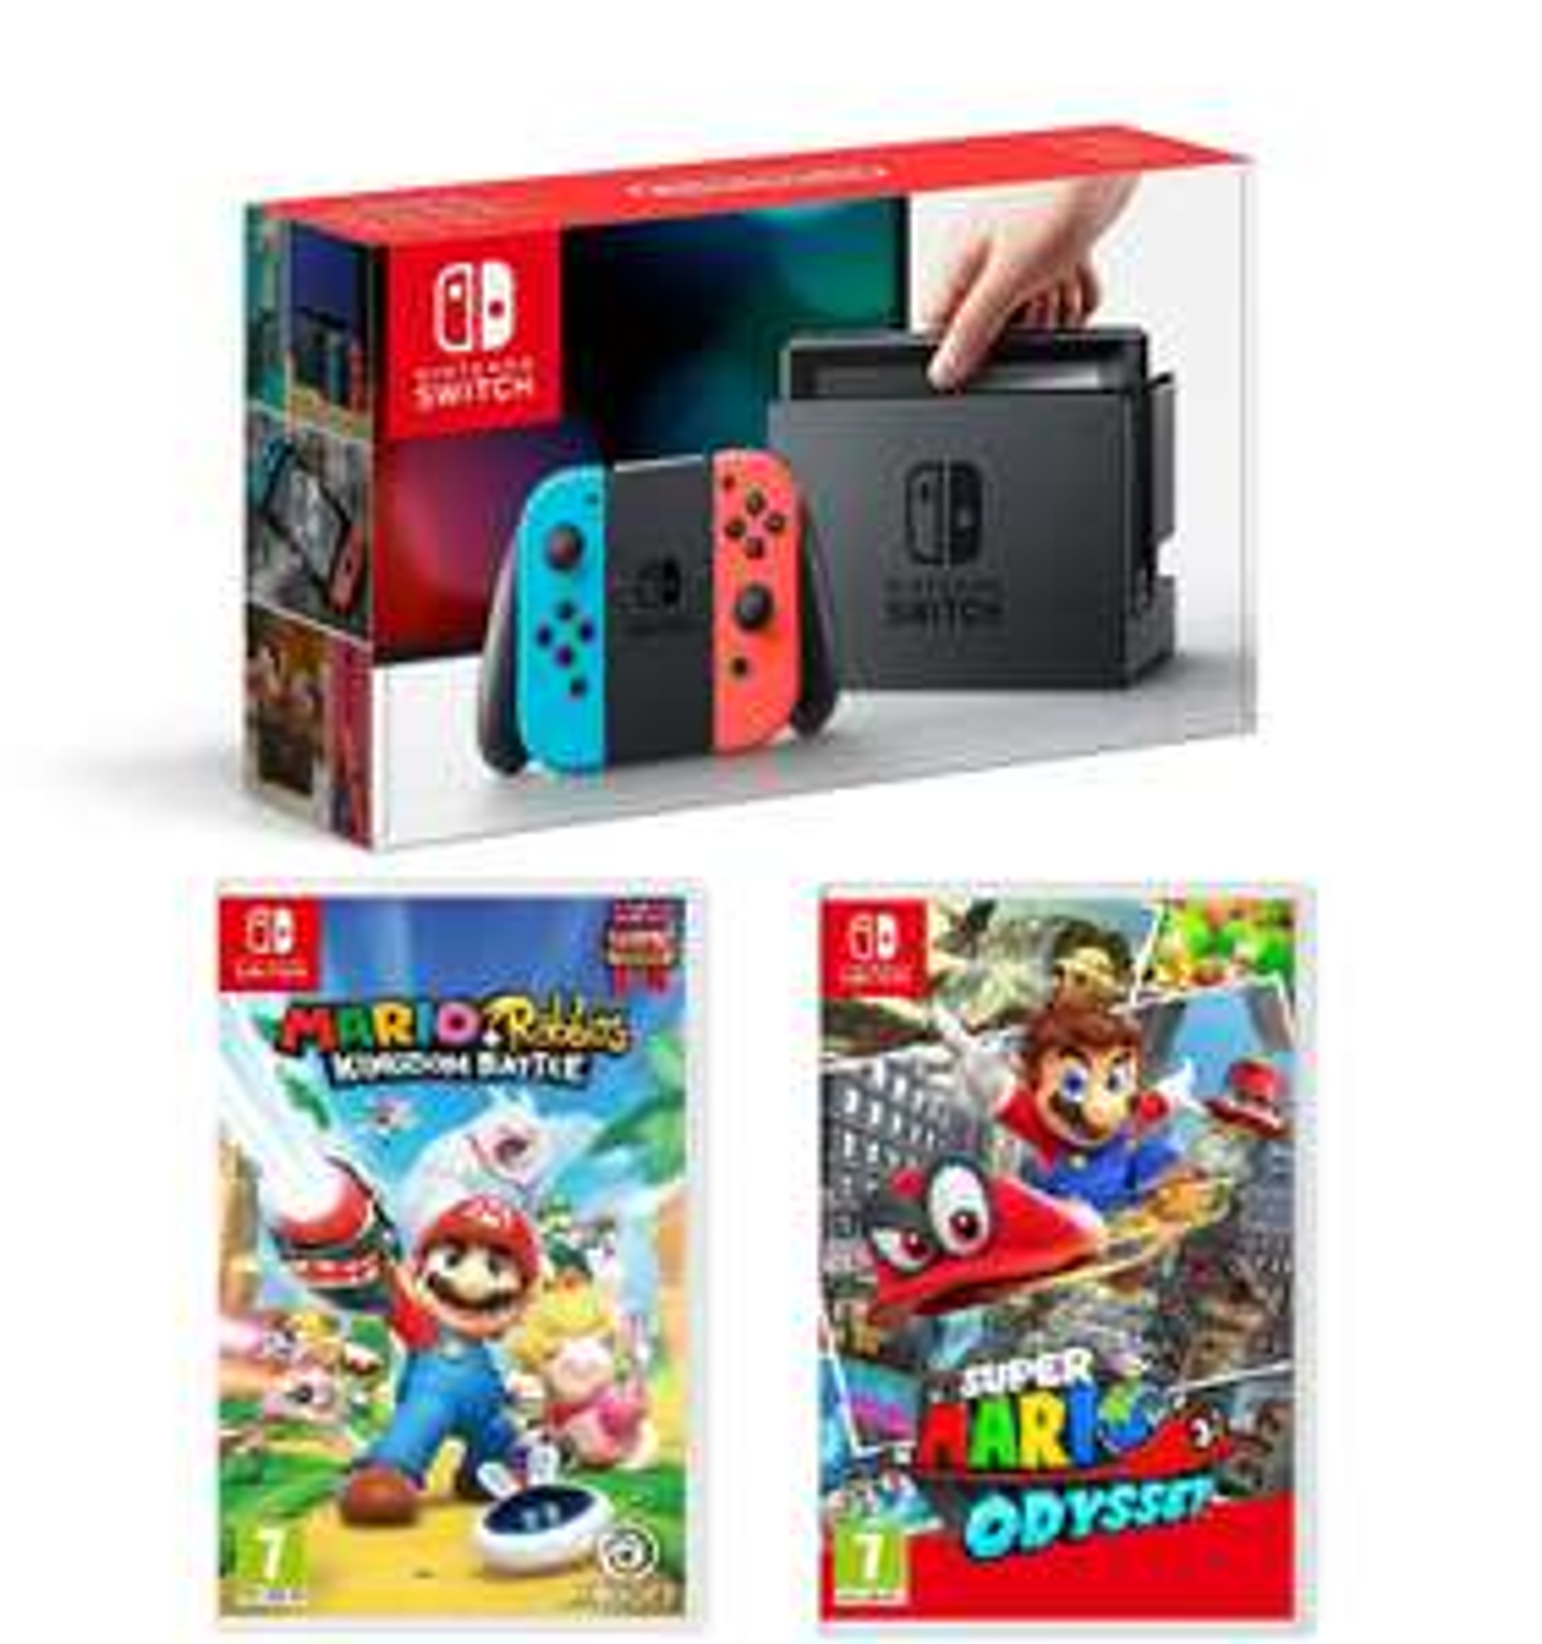 Nintendo Switch Neon + Super Mario Odyssey + Mario Rabbids Kingdom Battle £319 @ Tesco Direct